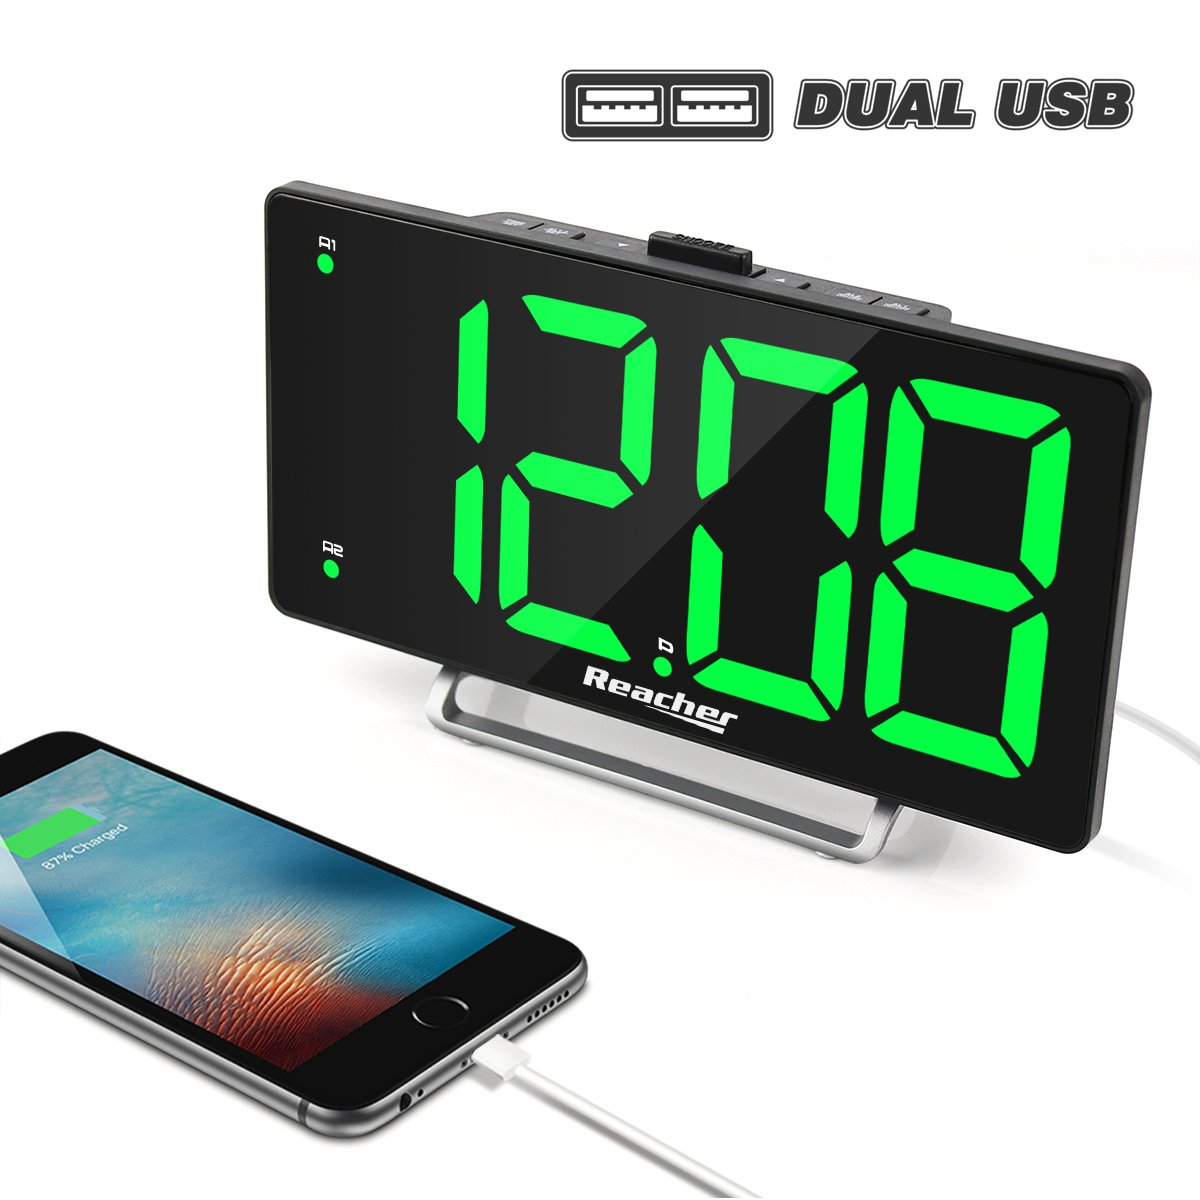 K-star Digital Alarm Clock 9'' Large LED Display Dual Alarm with USB Charger Port 0-100 Brightness Dimmer Simple Operation Bedside Alarm Clock for Bedrooms